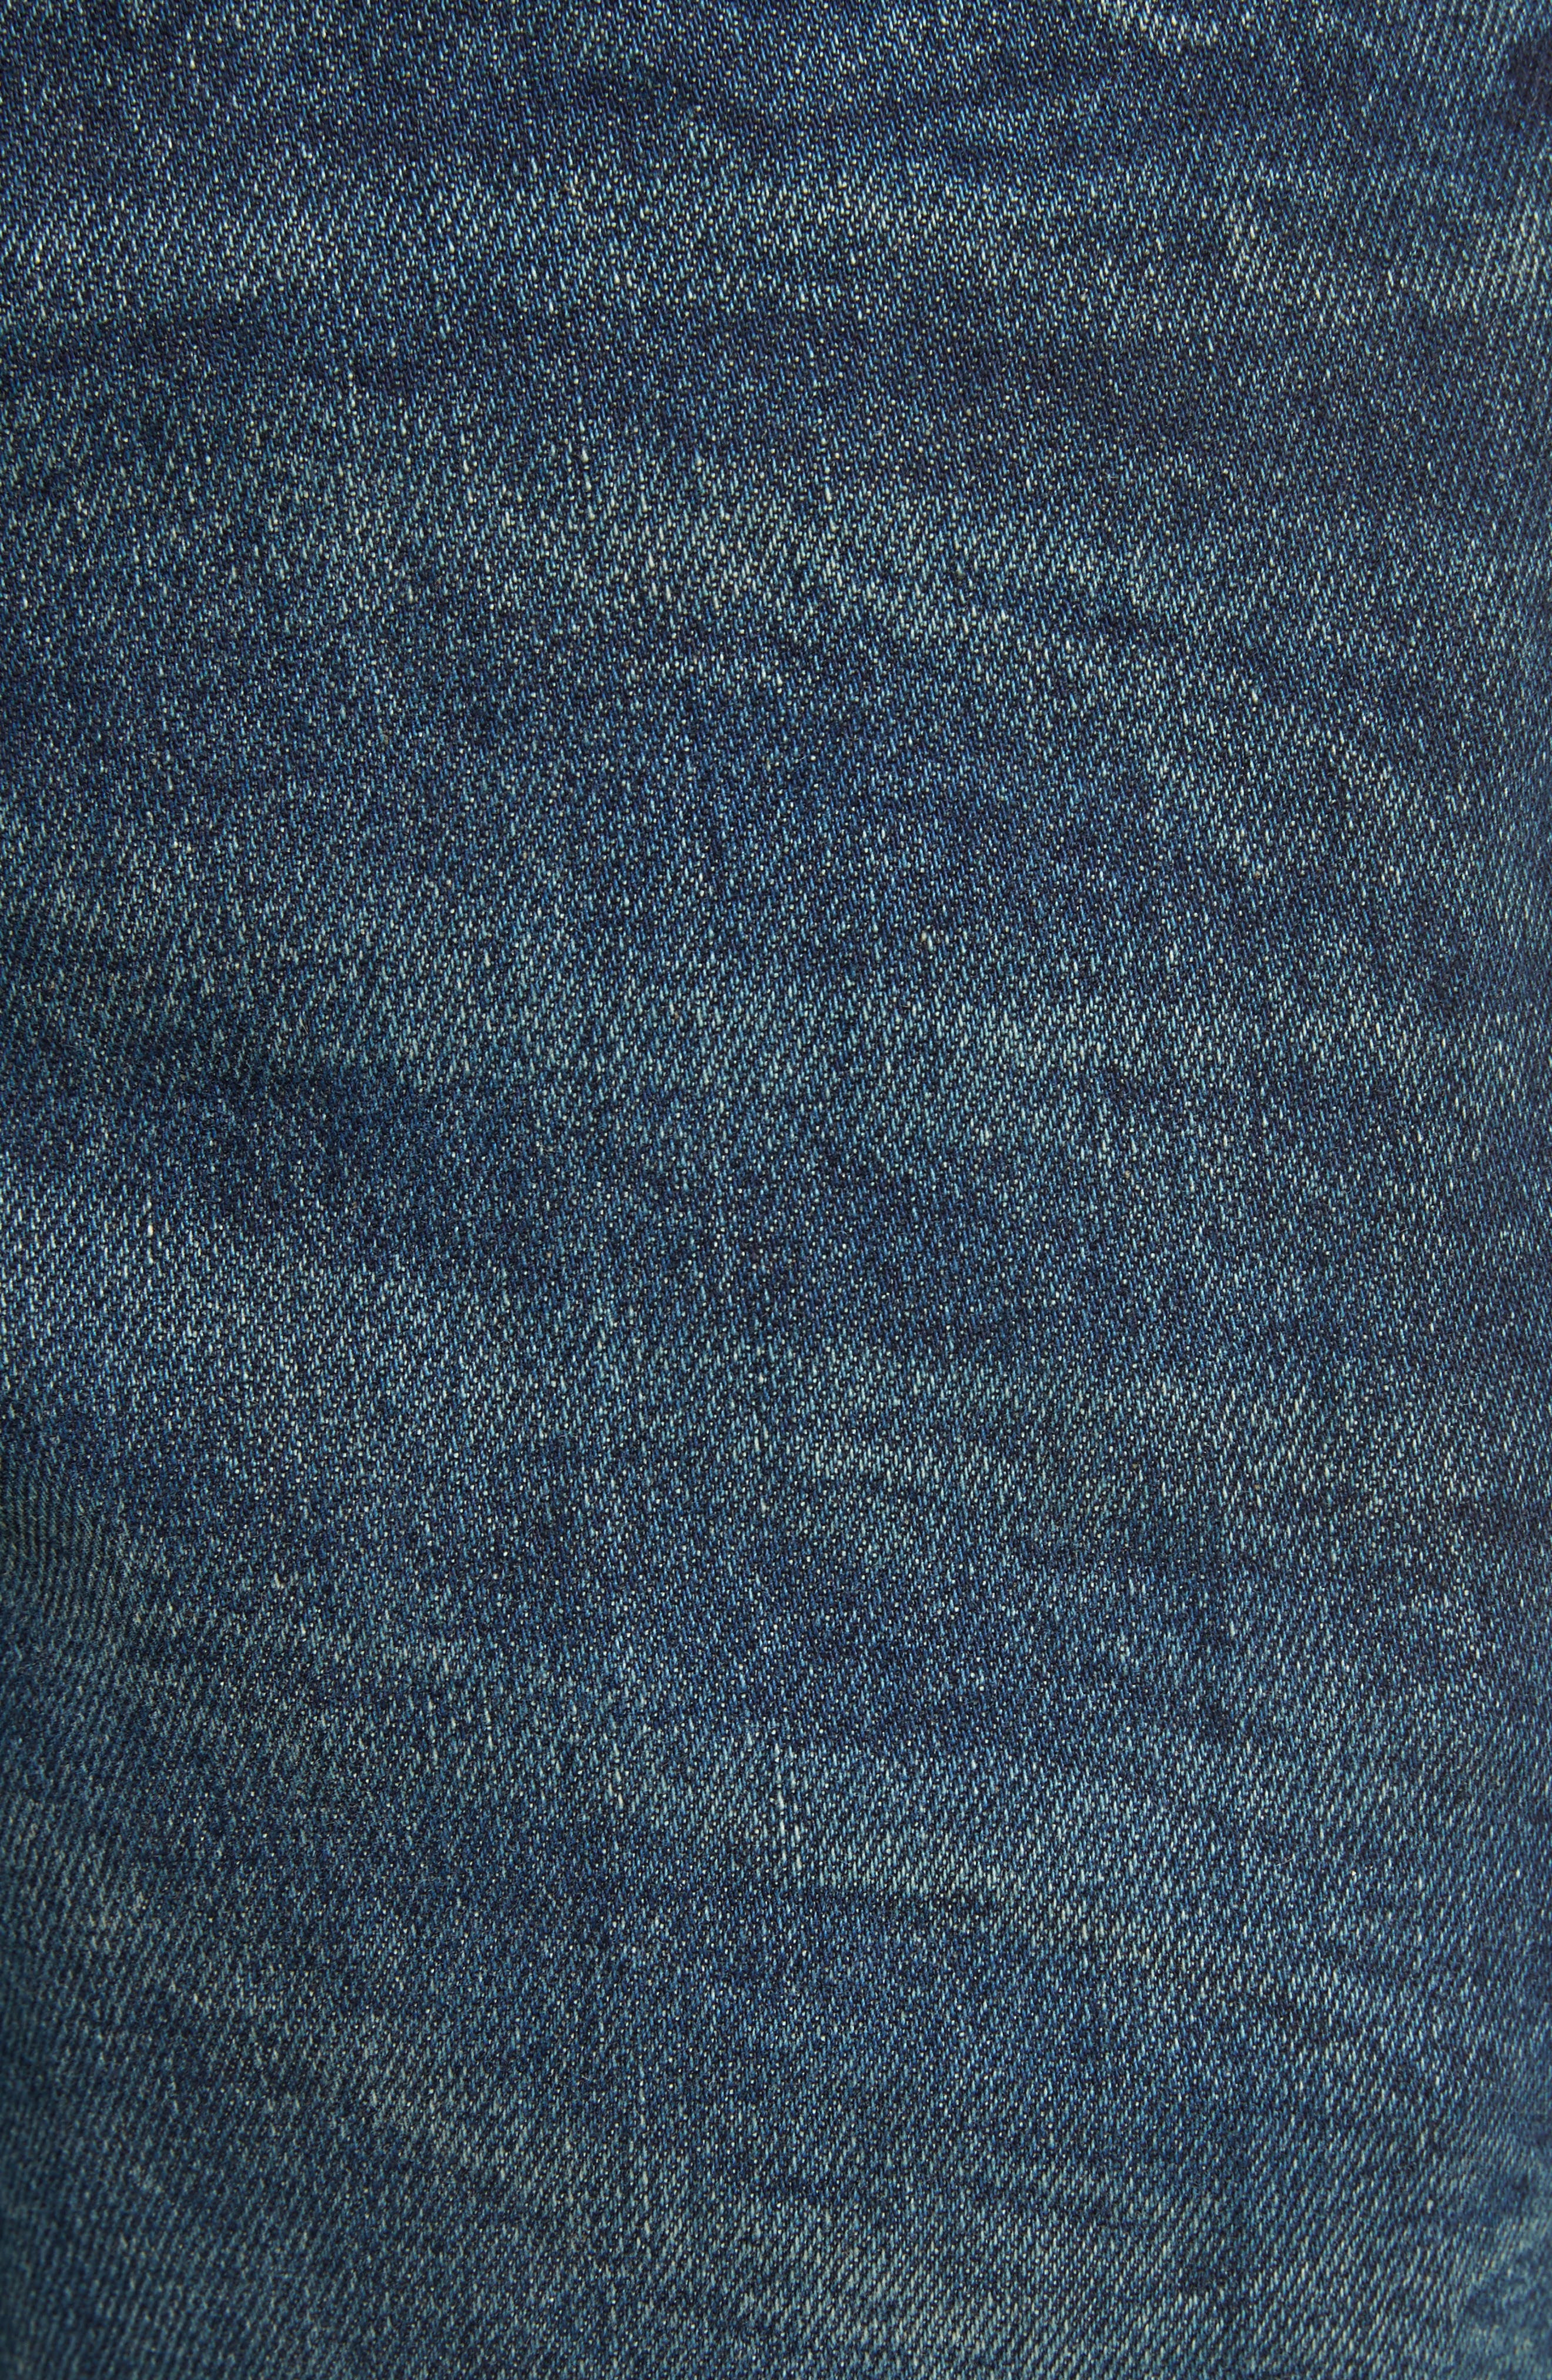 Moto Jeans,                             Alternate thumbnail 5, color,                             Indigo Blue